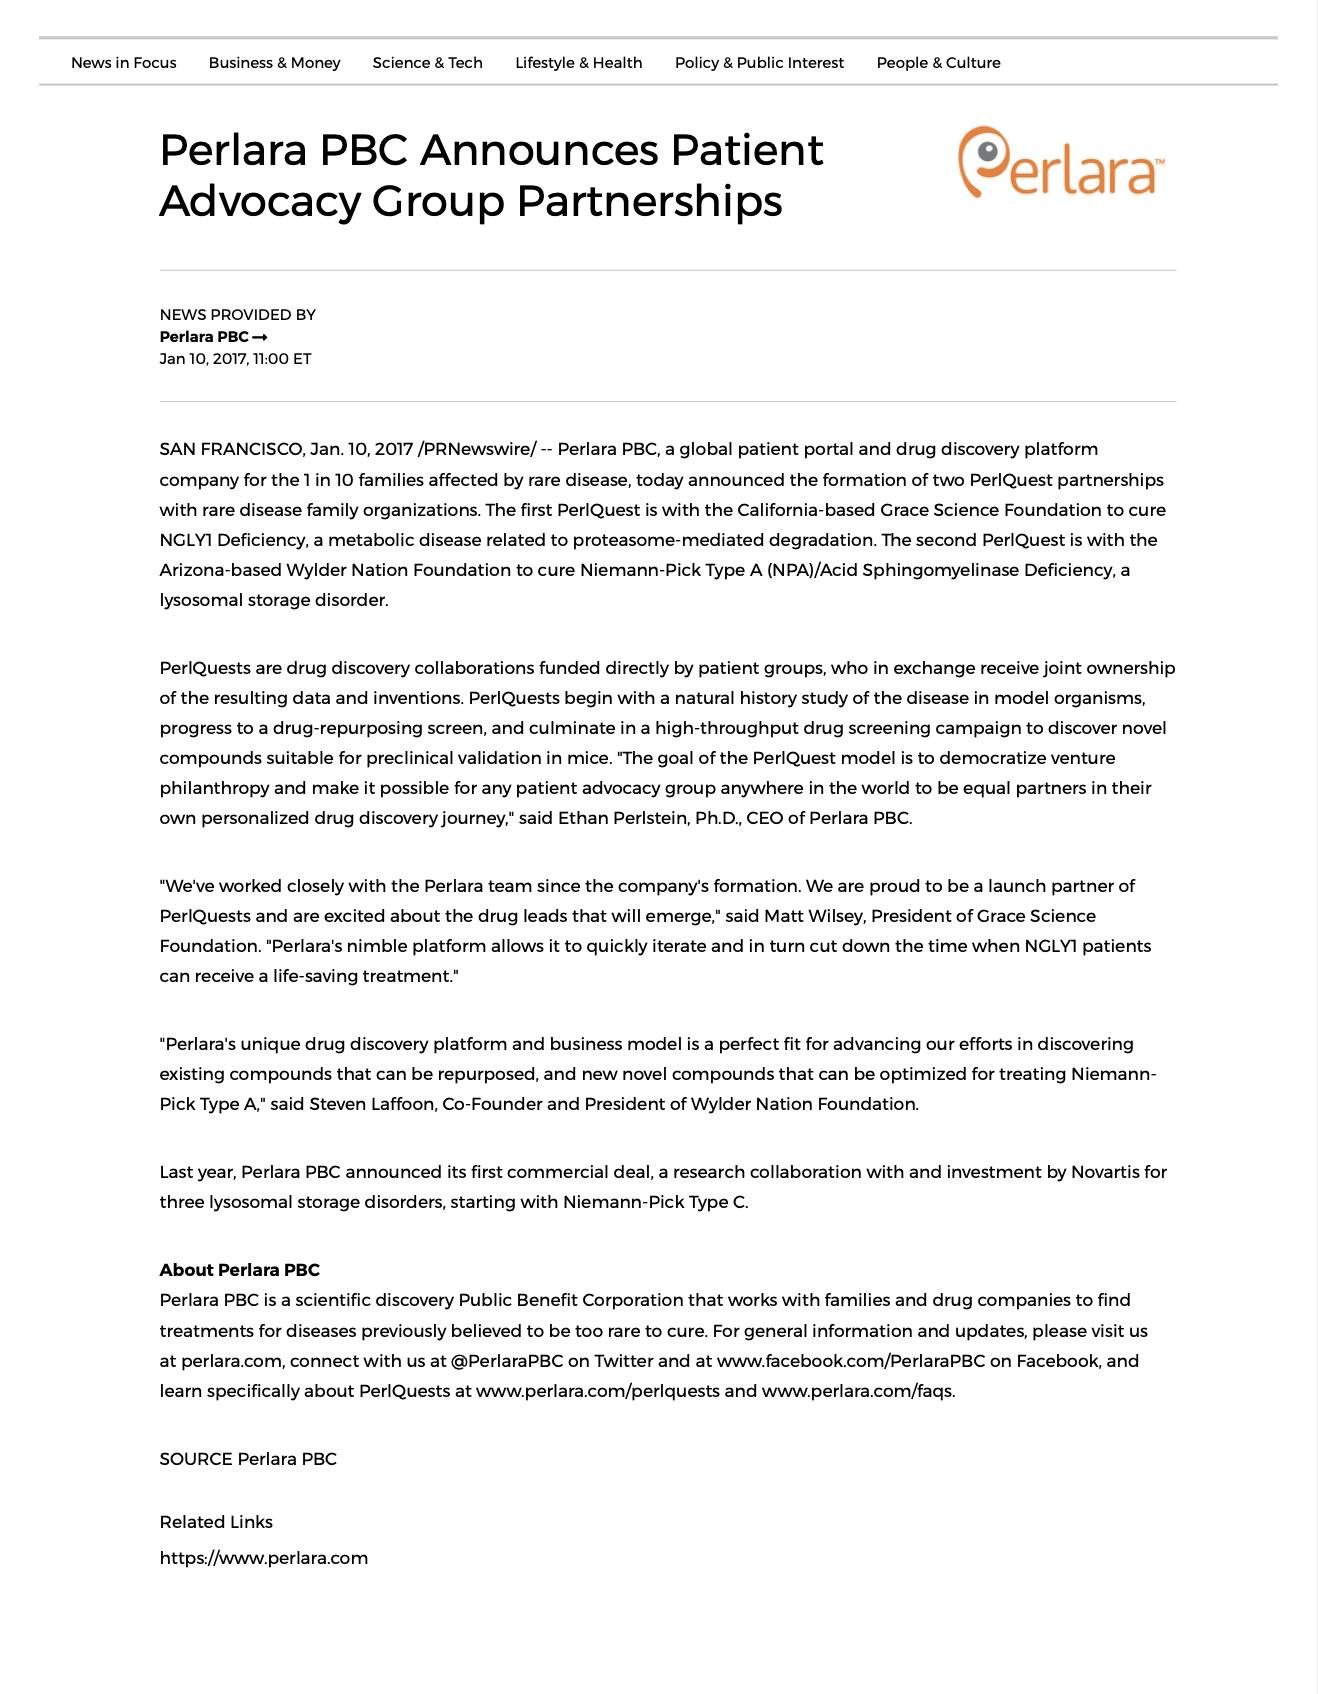 Perlara PBC Announces Patient Advocacy Group Partnerships